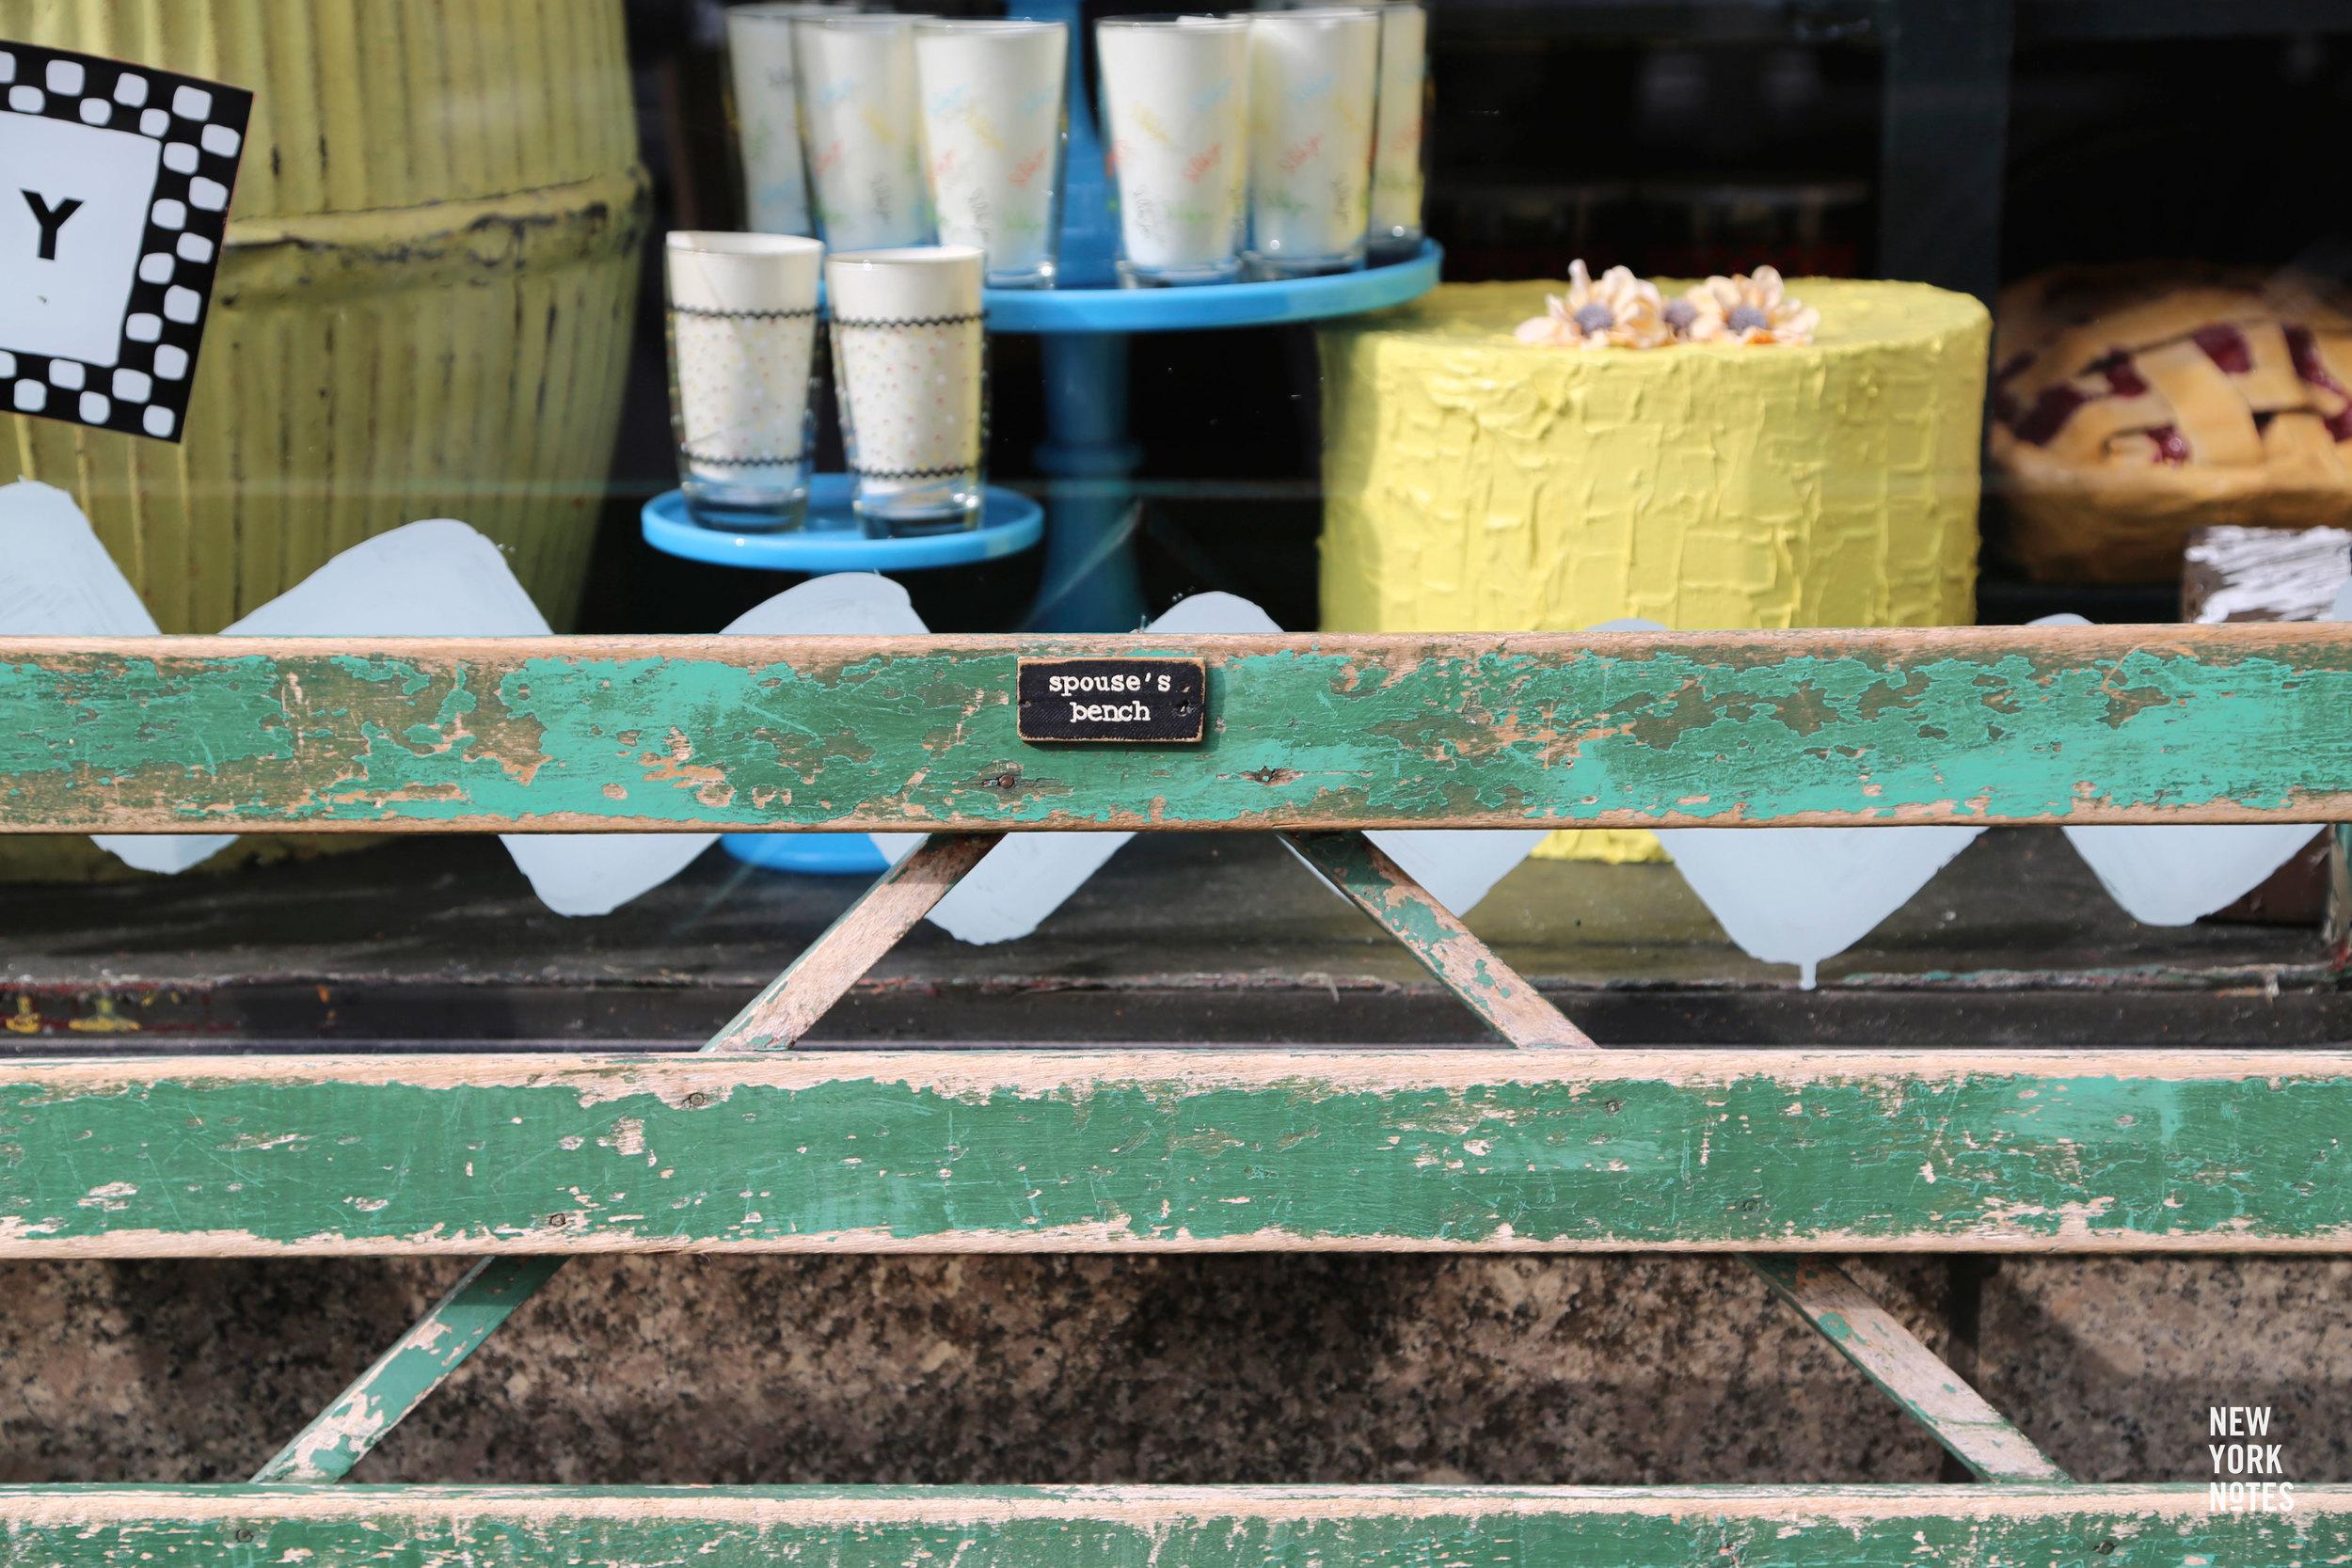 fishs-eddy-spouses-bench.jpg